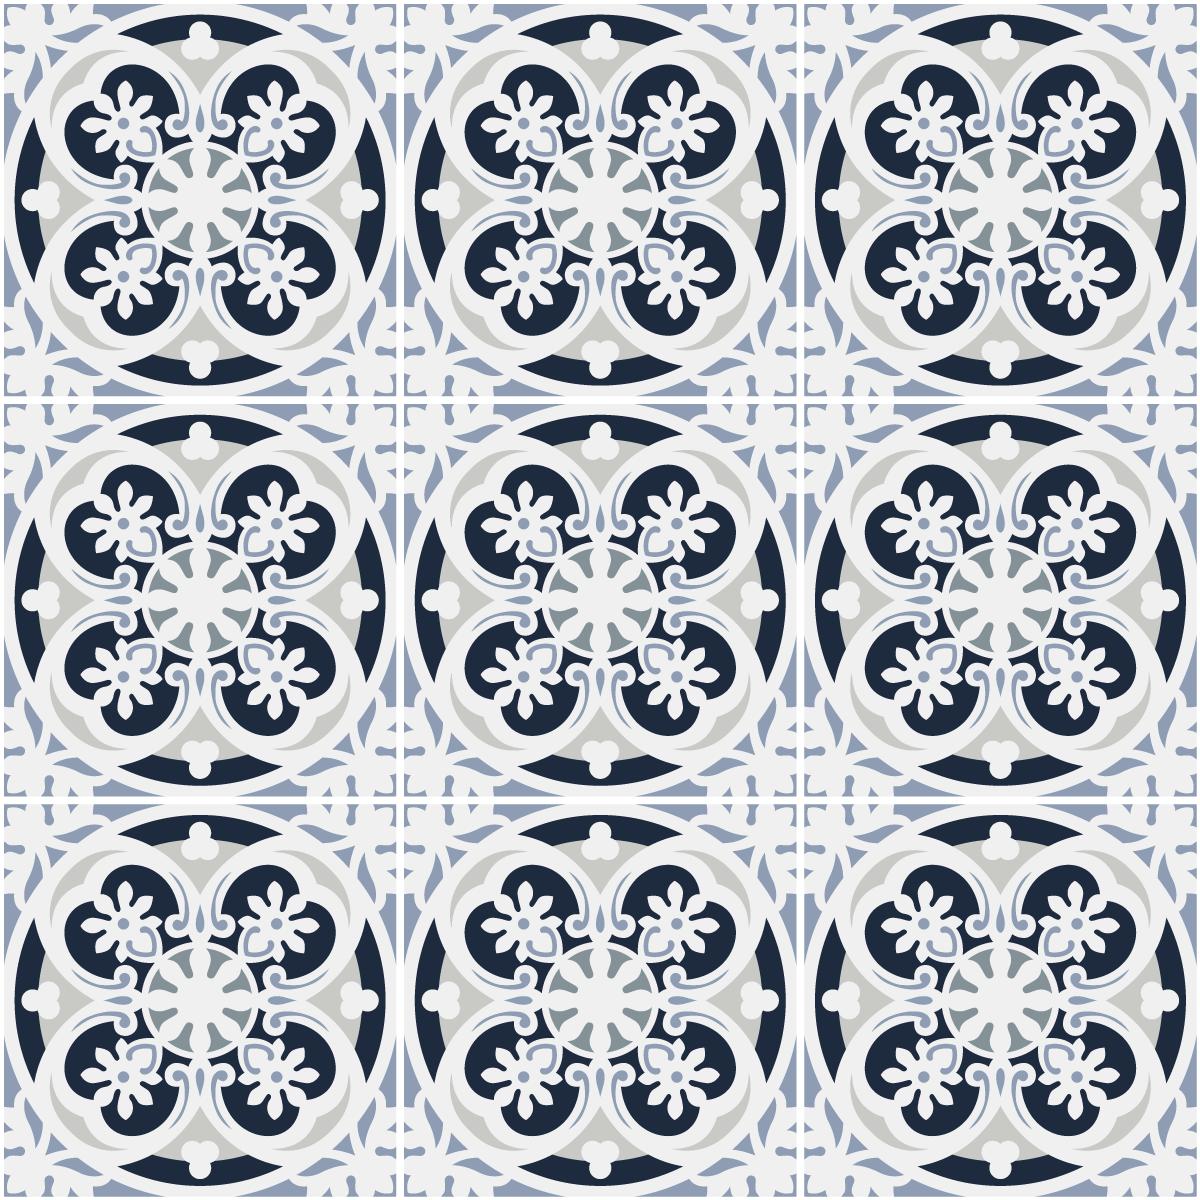 9 stickers carreaux de ciment azulejos giselda cuisine. Black Bedroom Furniture Sets. Home Design Ideas